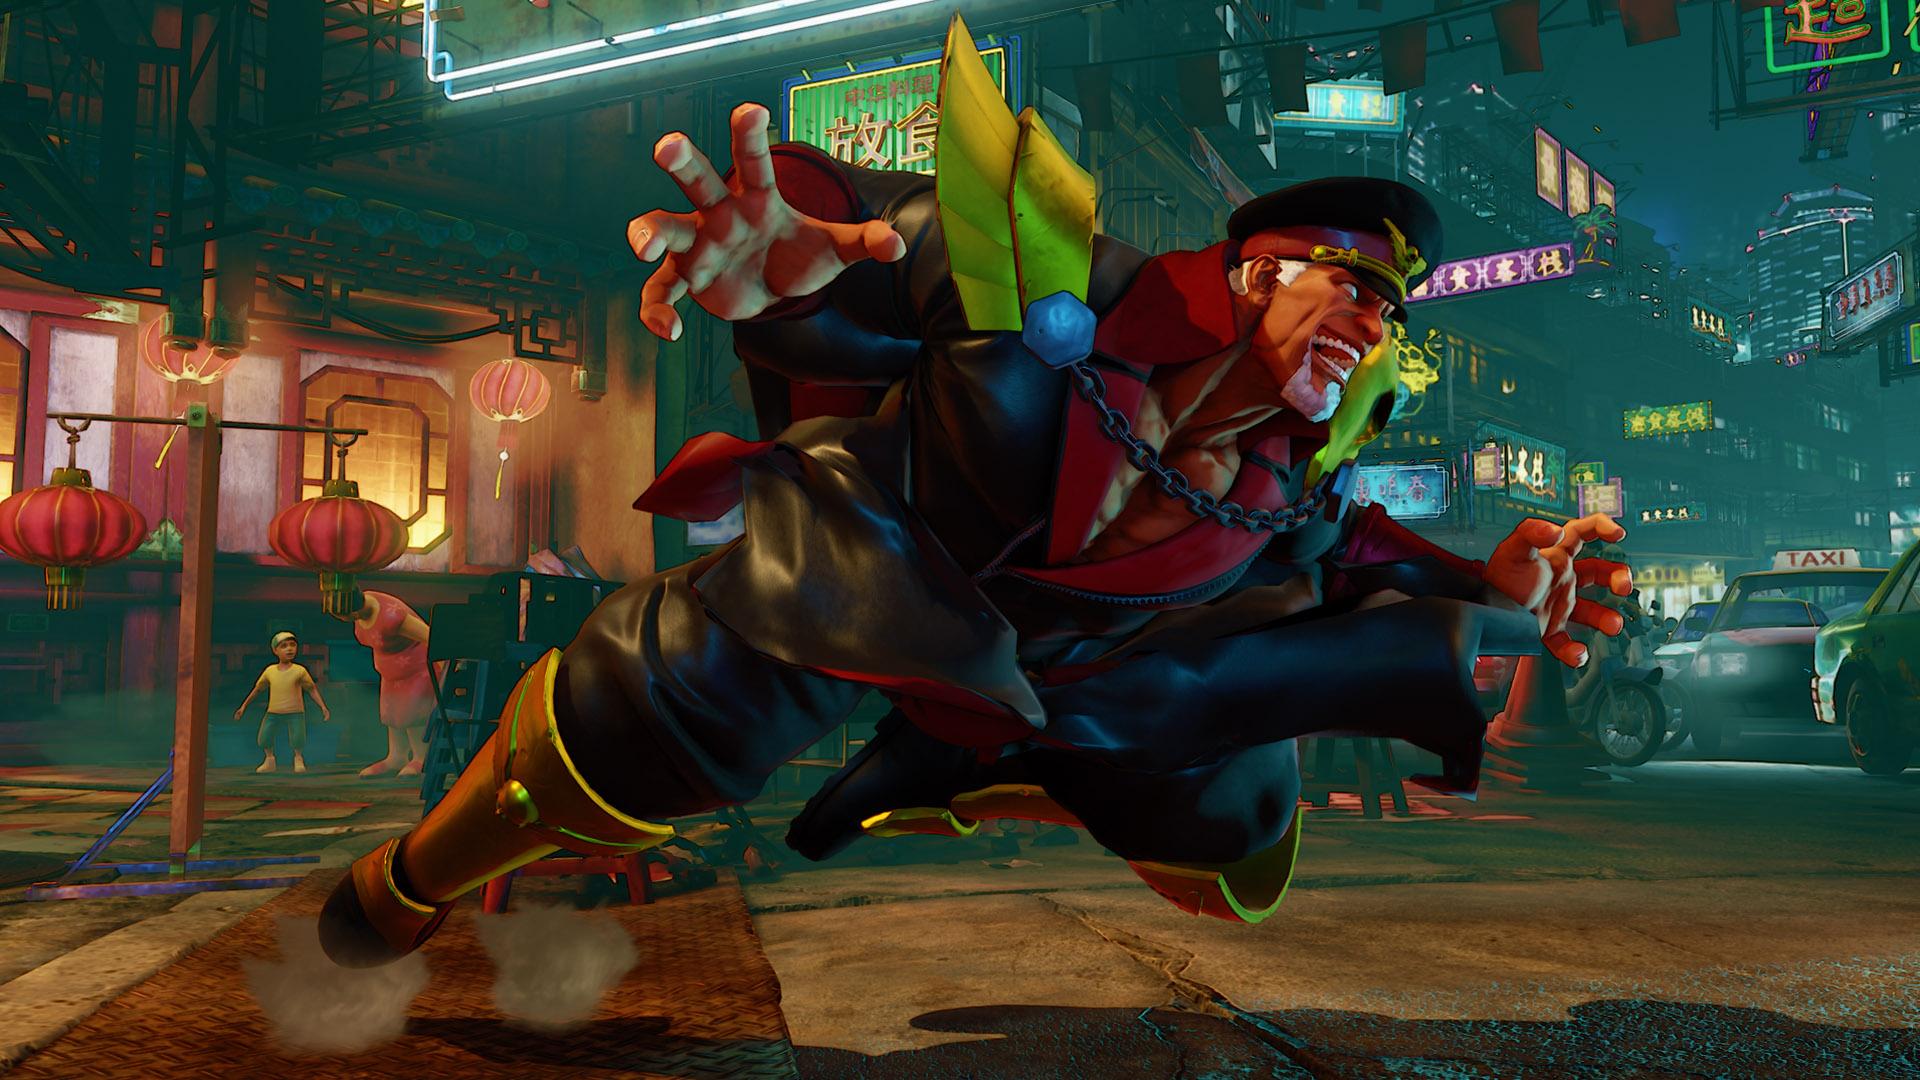 Zeku Is Street Fighter V's Next DLC Character